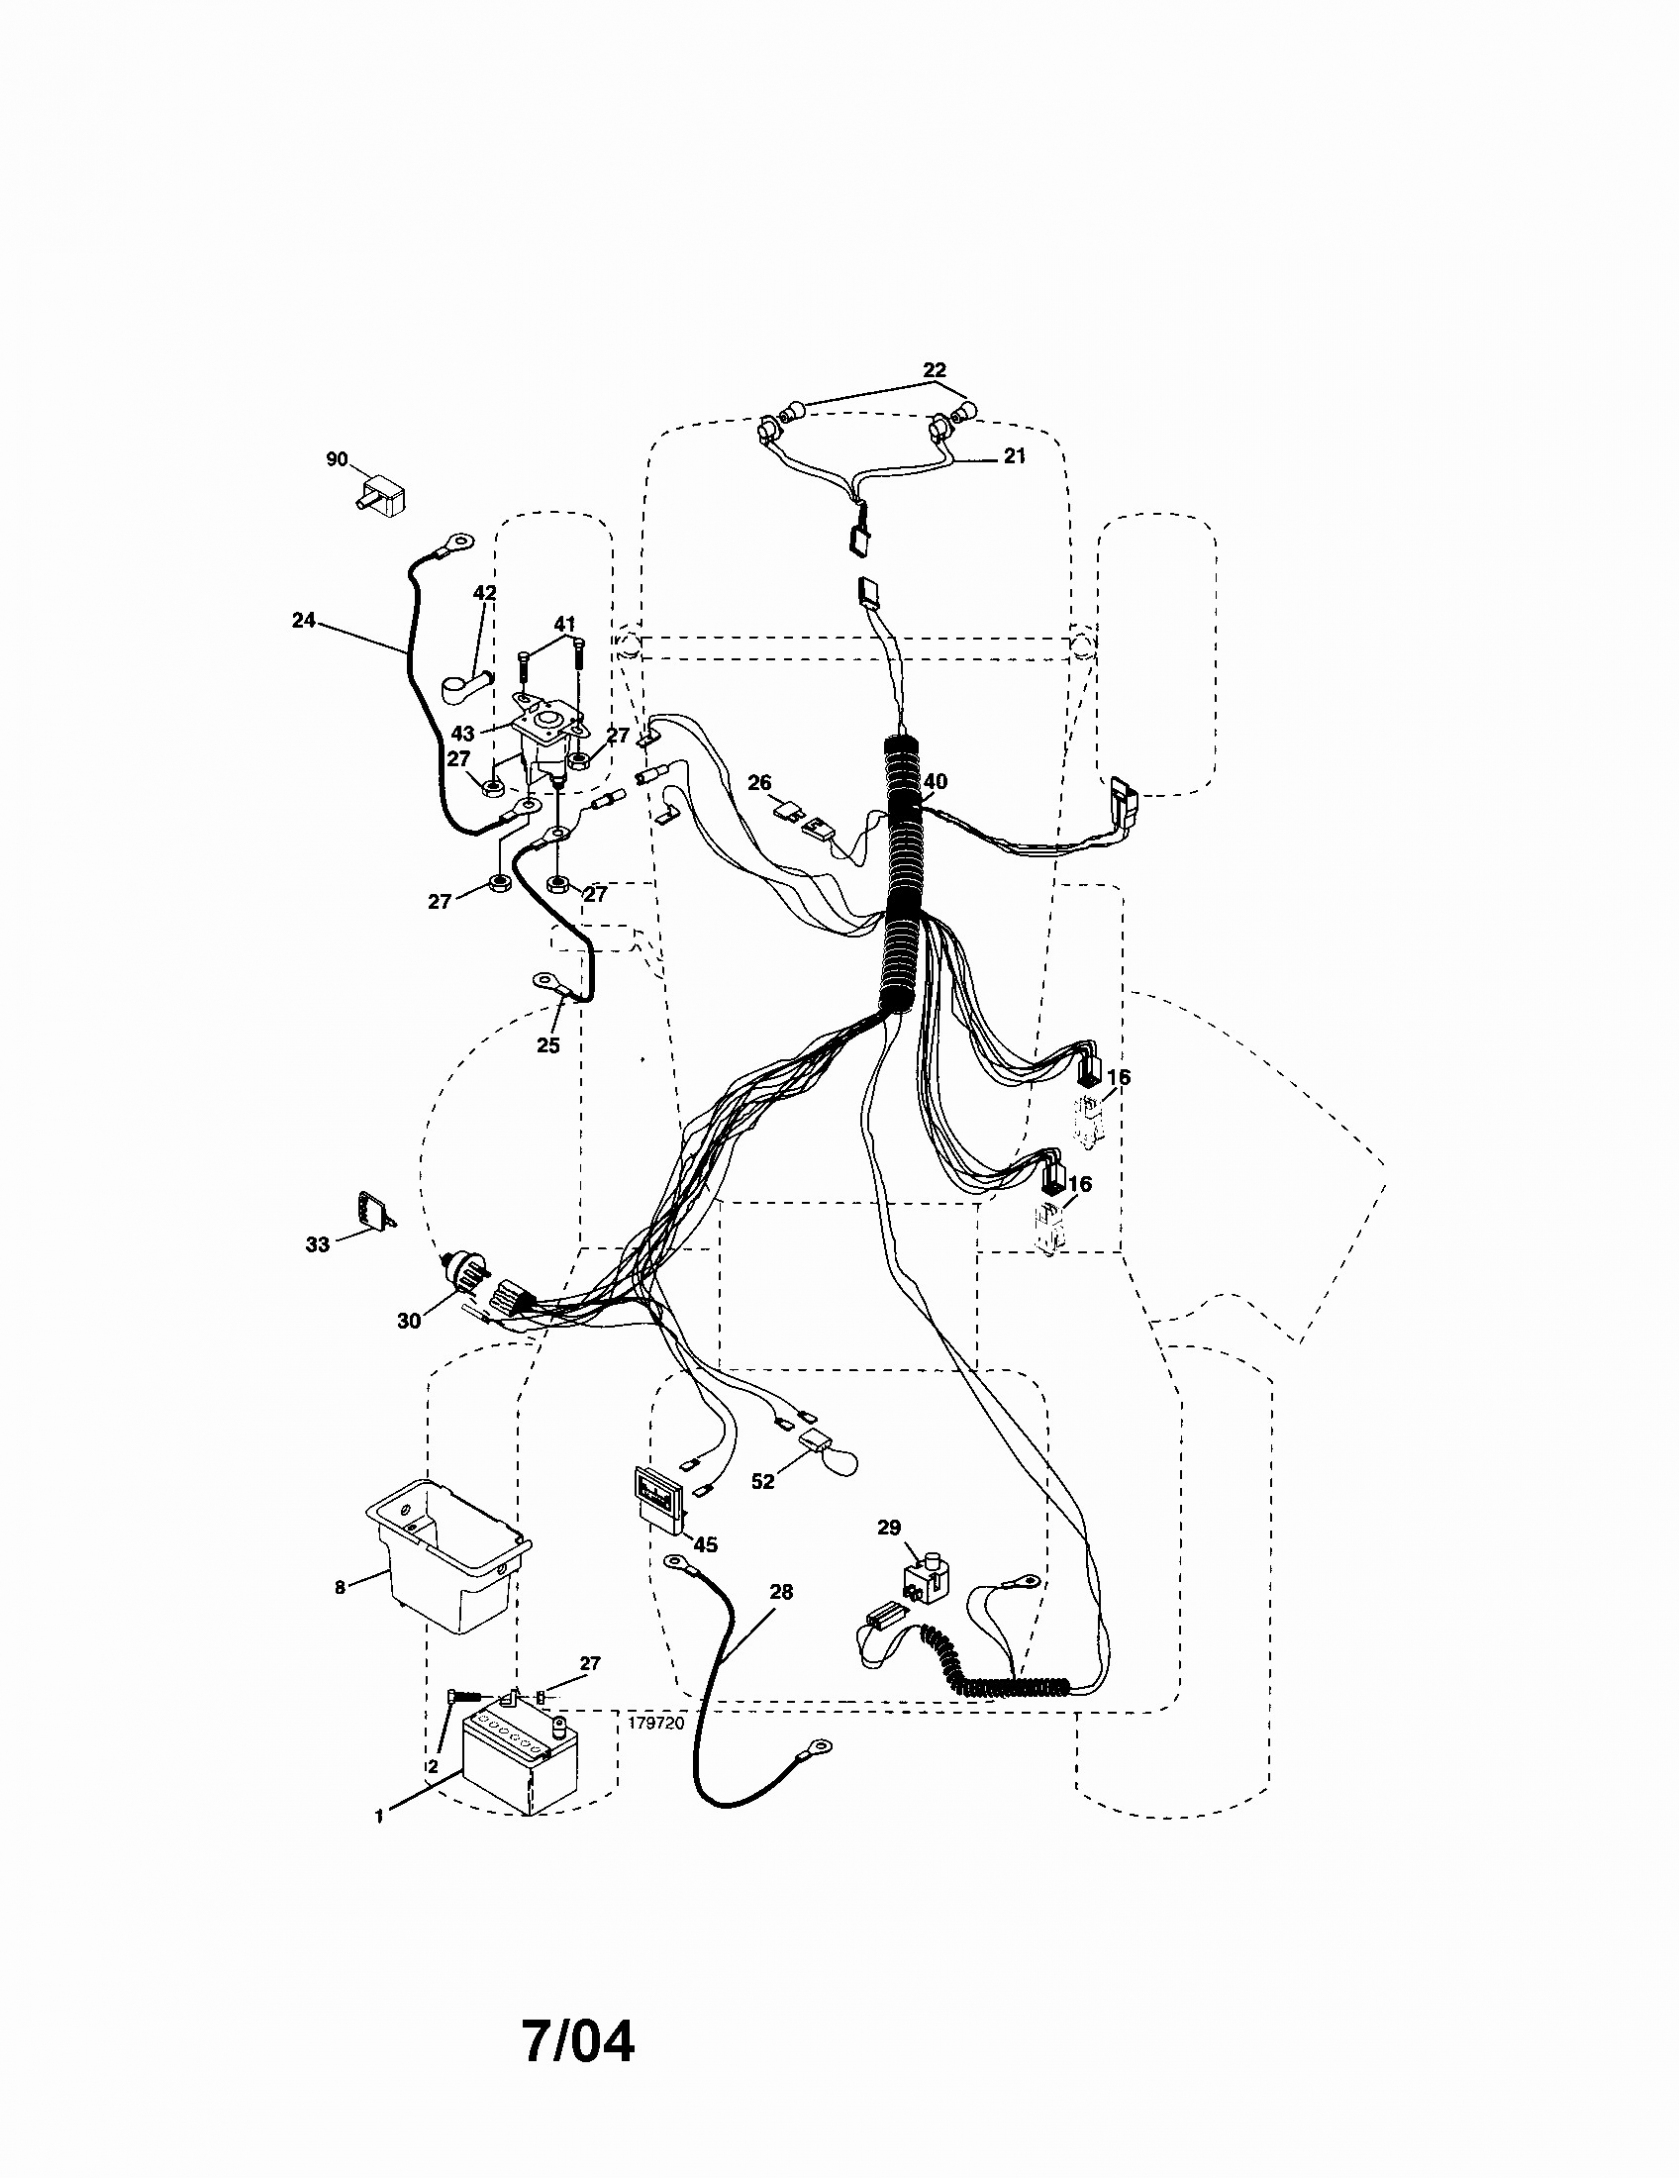 17 Hp Briggs And Stratton Engine Wiring Diagram | Wiring Diagram - Briggs And Stratton V-Twin Wiring Diagram